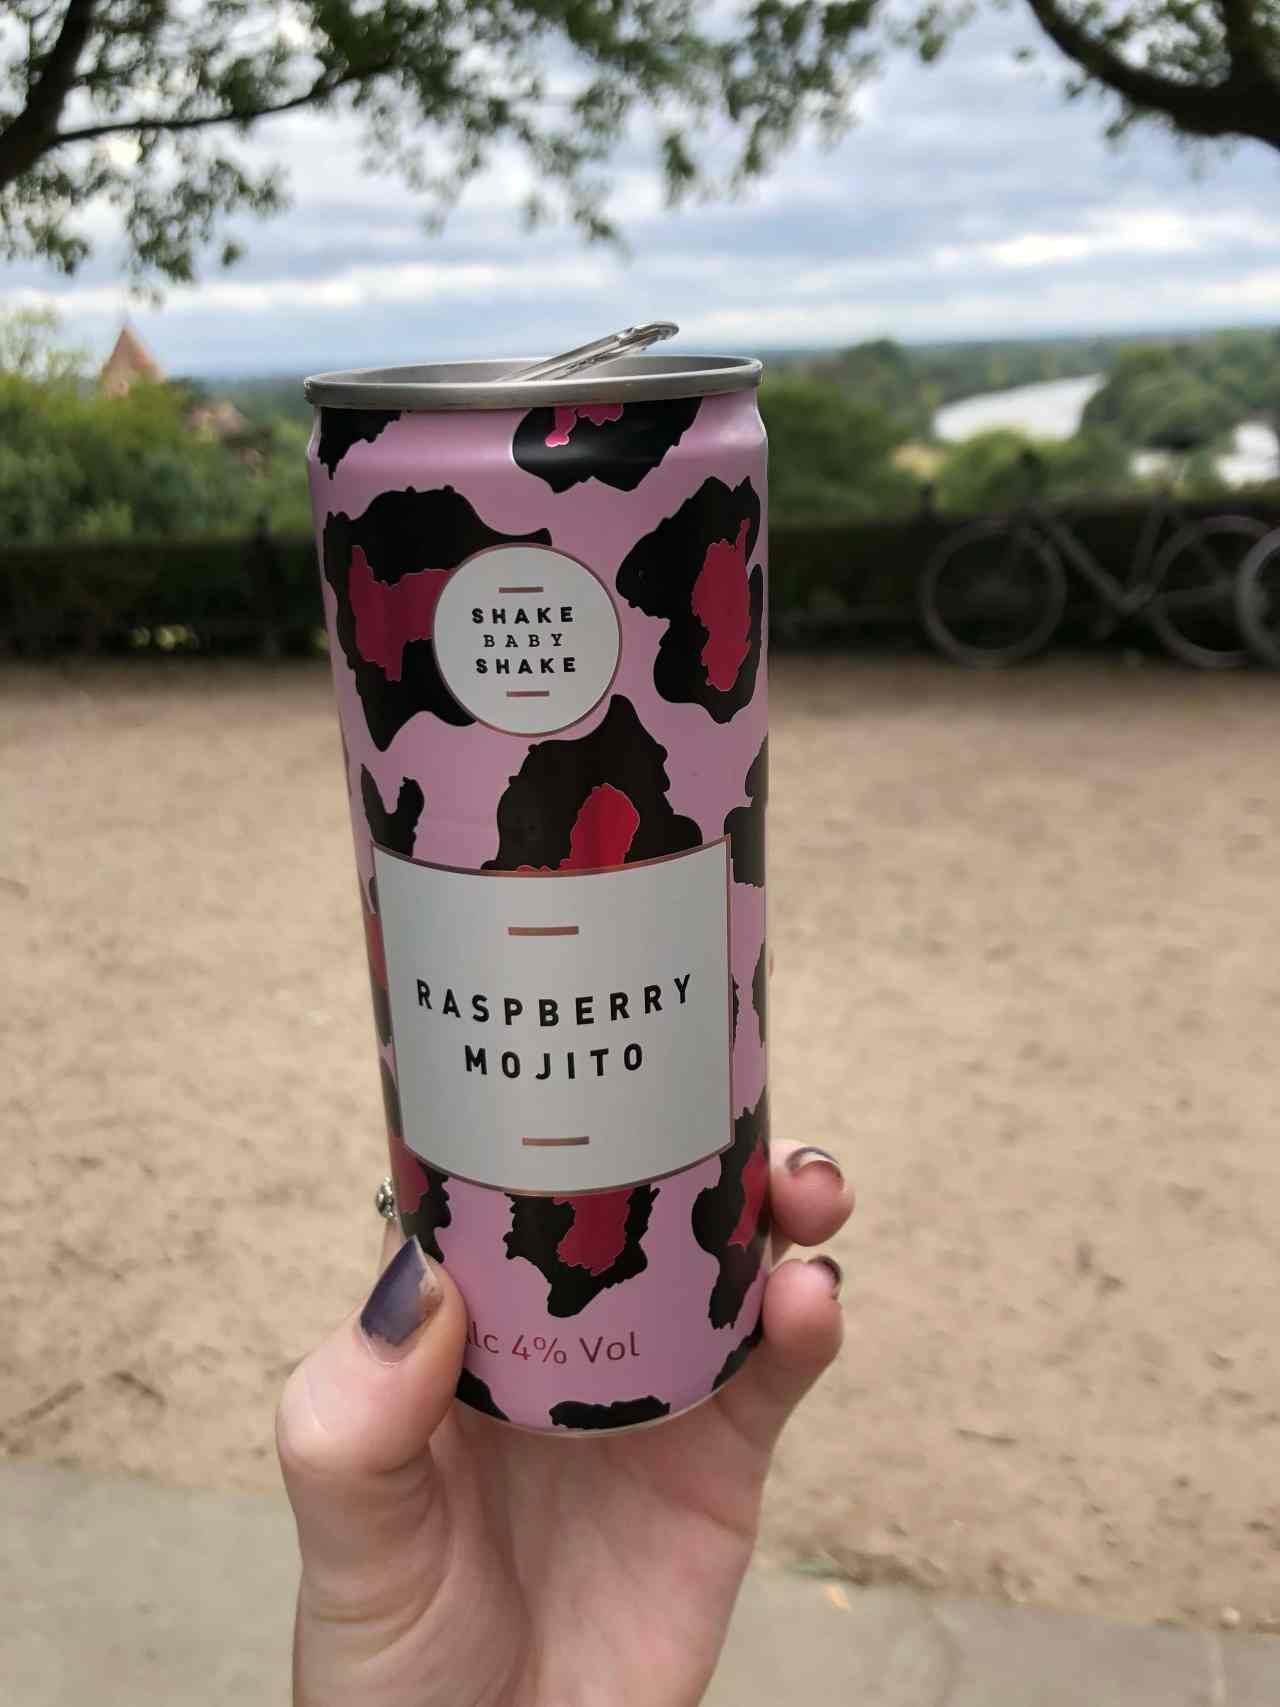 Shake baby Shake raspberry mojito with a view